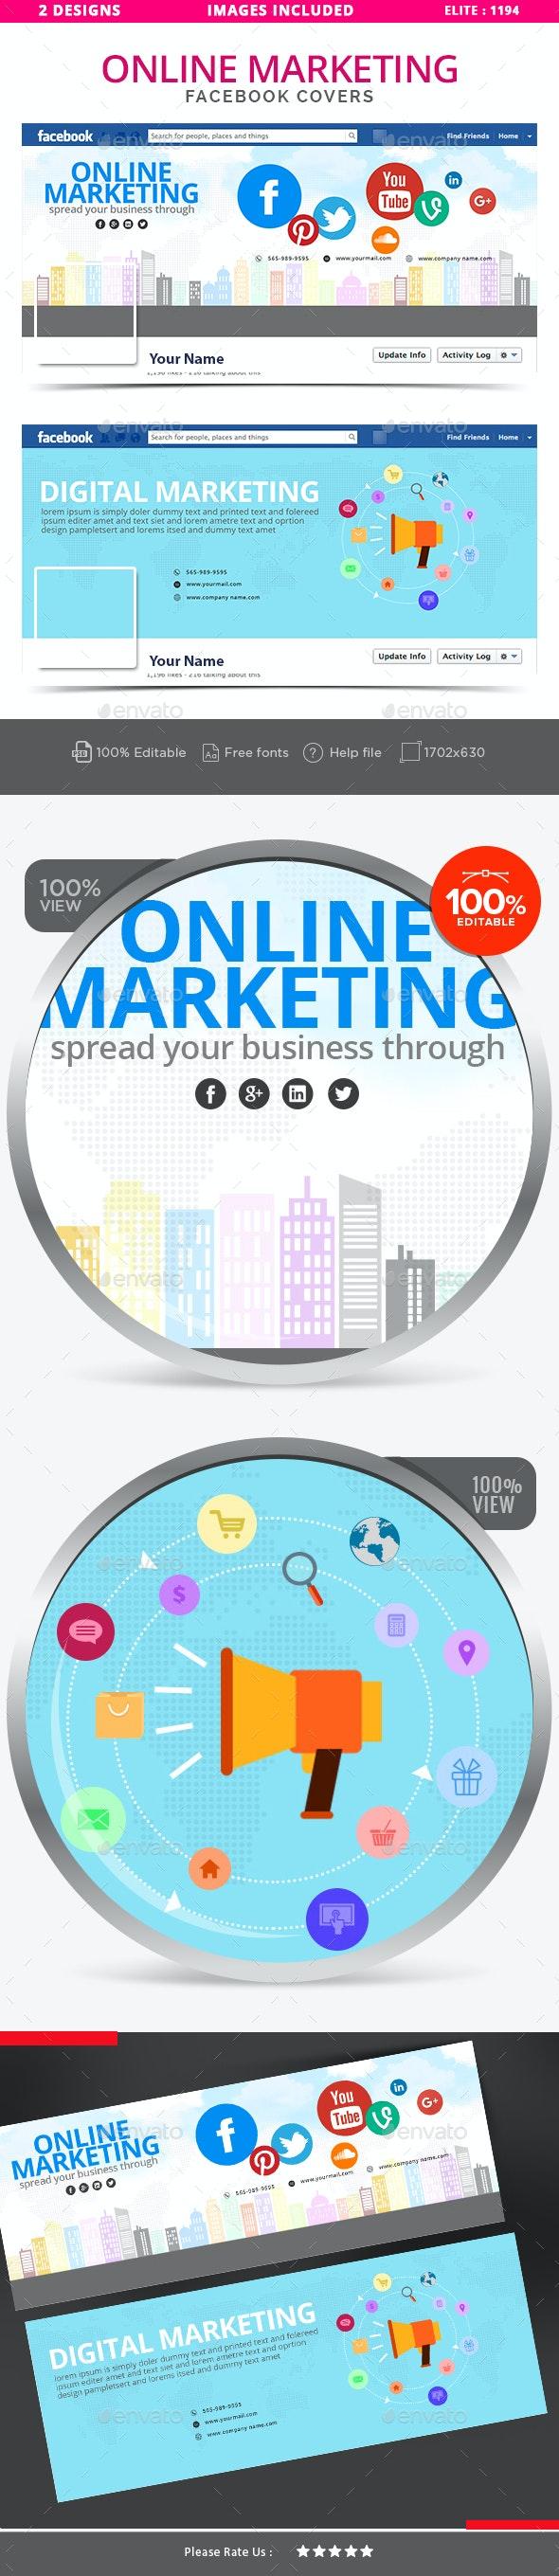 Online Marketing Facebook Covers - 2 Designs - Facebook Timeline Covers Social Media